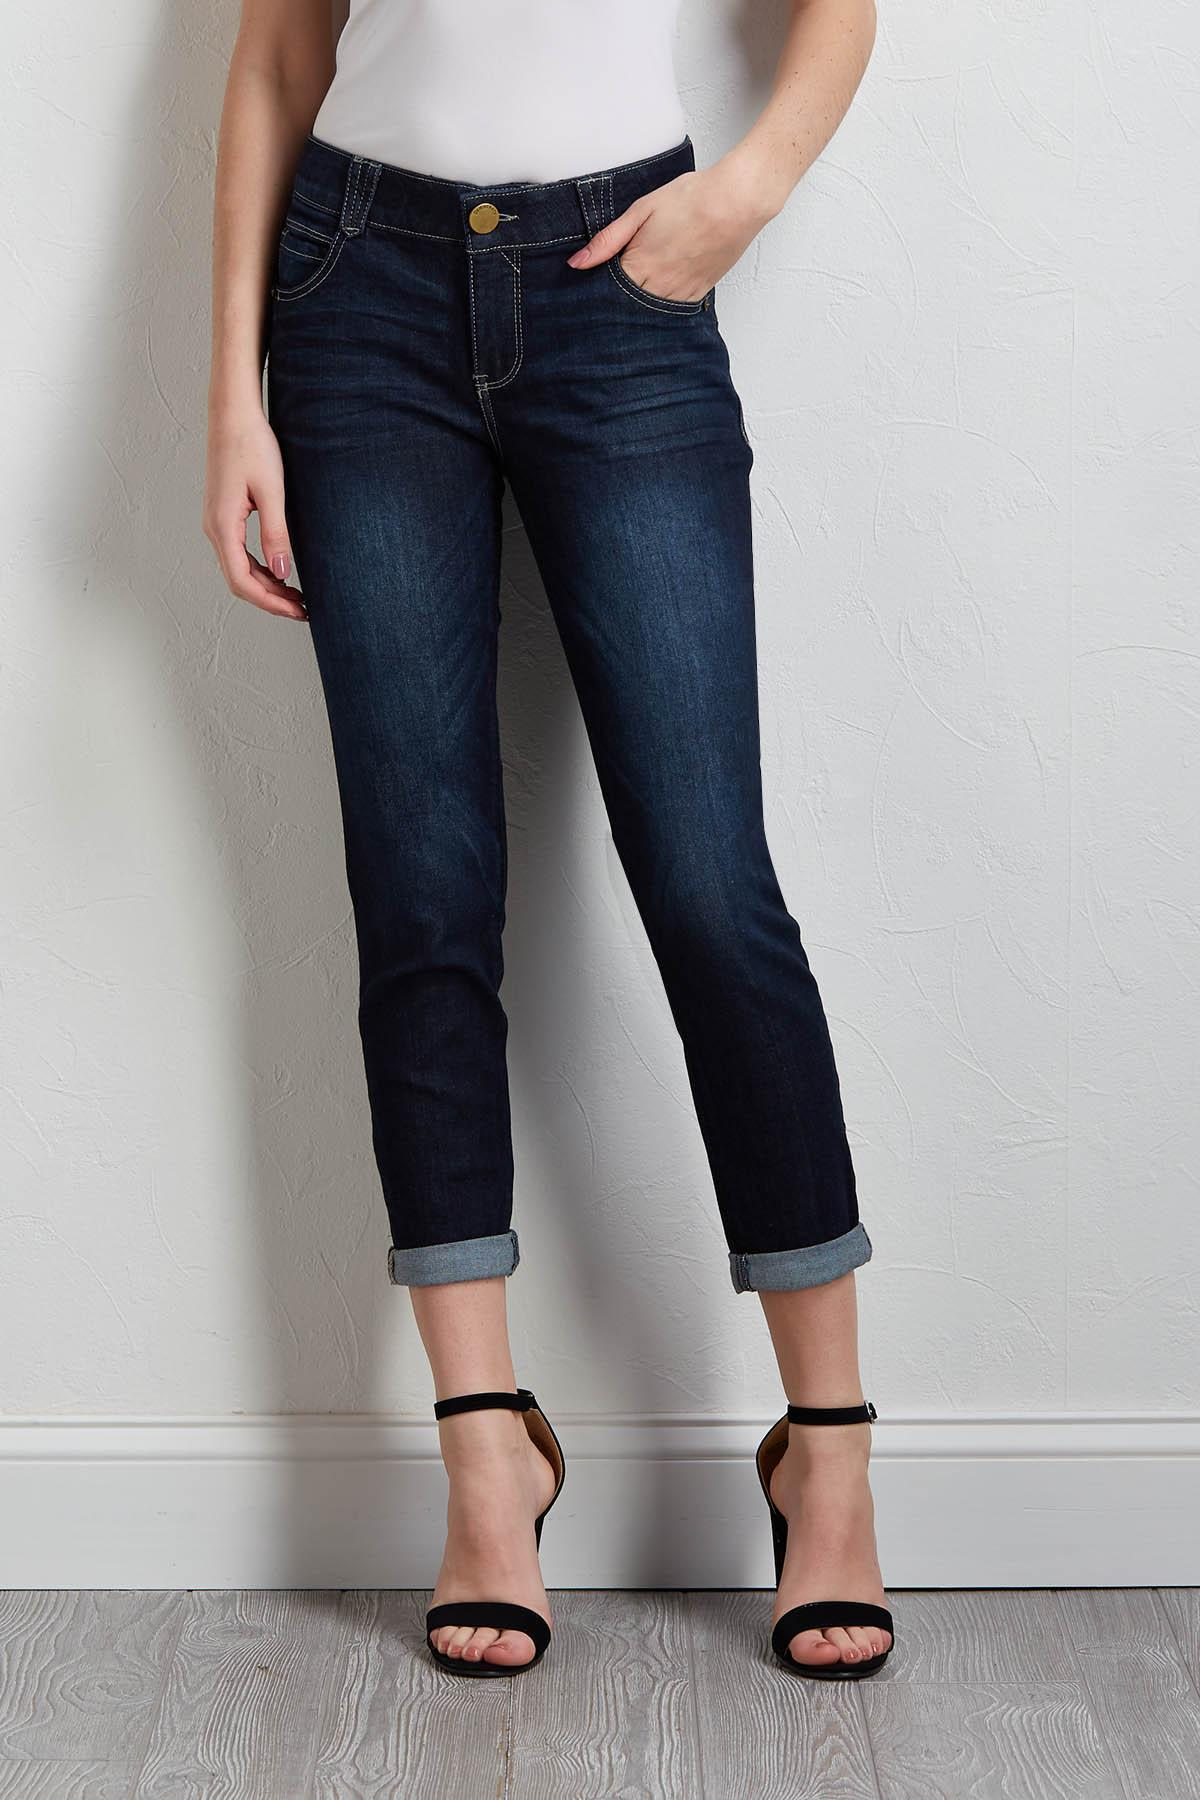 Shape Enhancing Skimmer Jeans